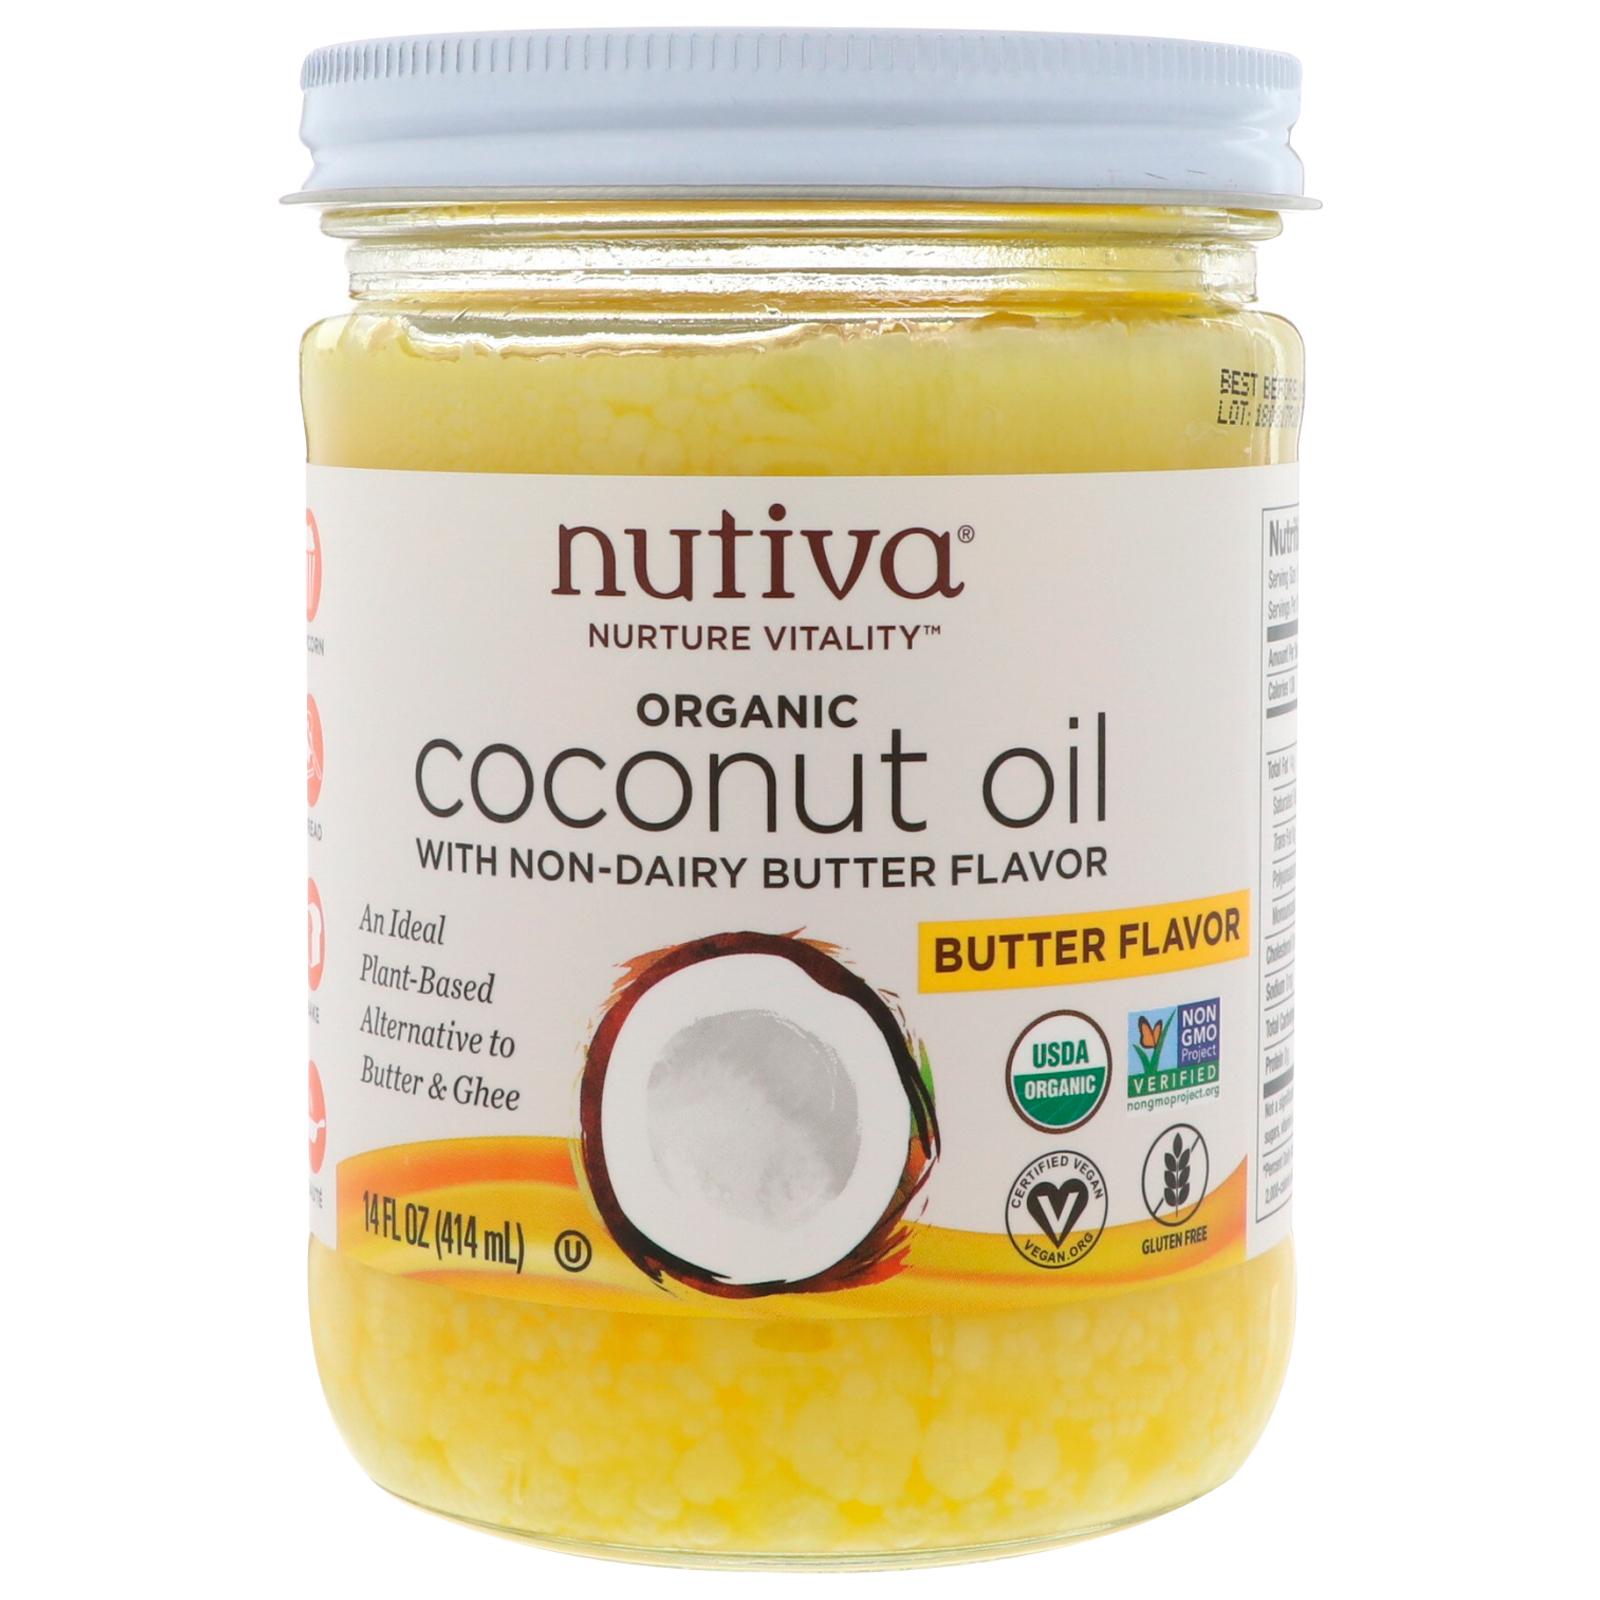 Nutiva, Organic Coconut Oil, Butter Flavor, 14 fl oz (414 ml